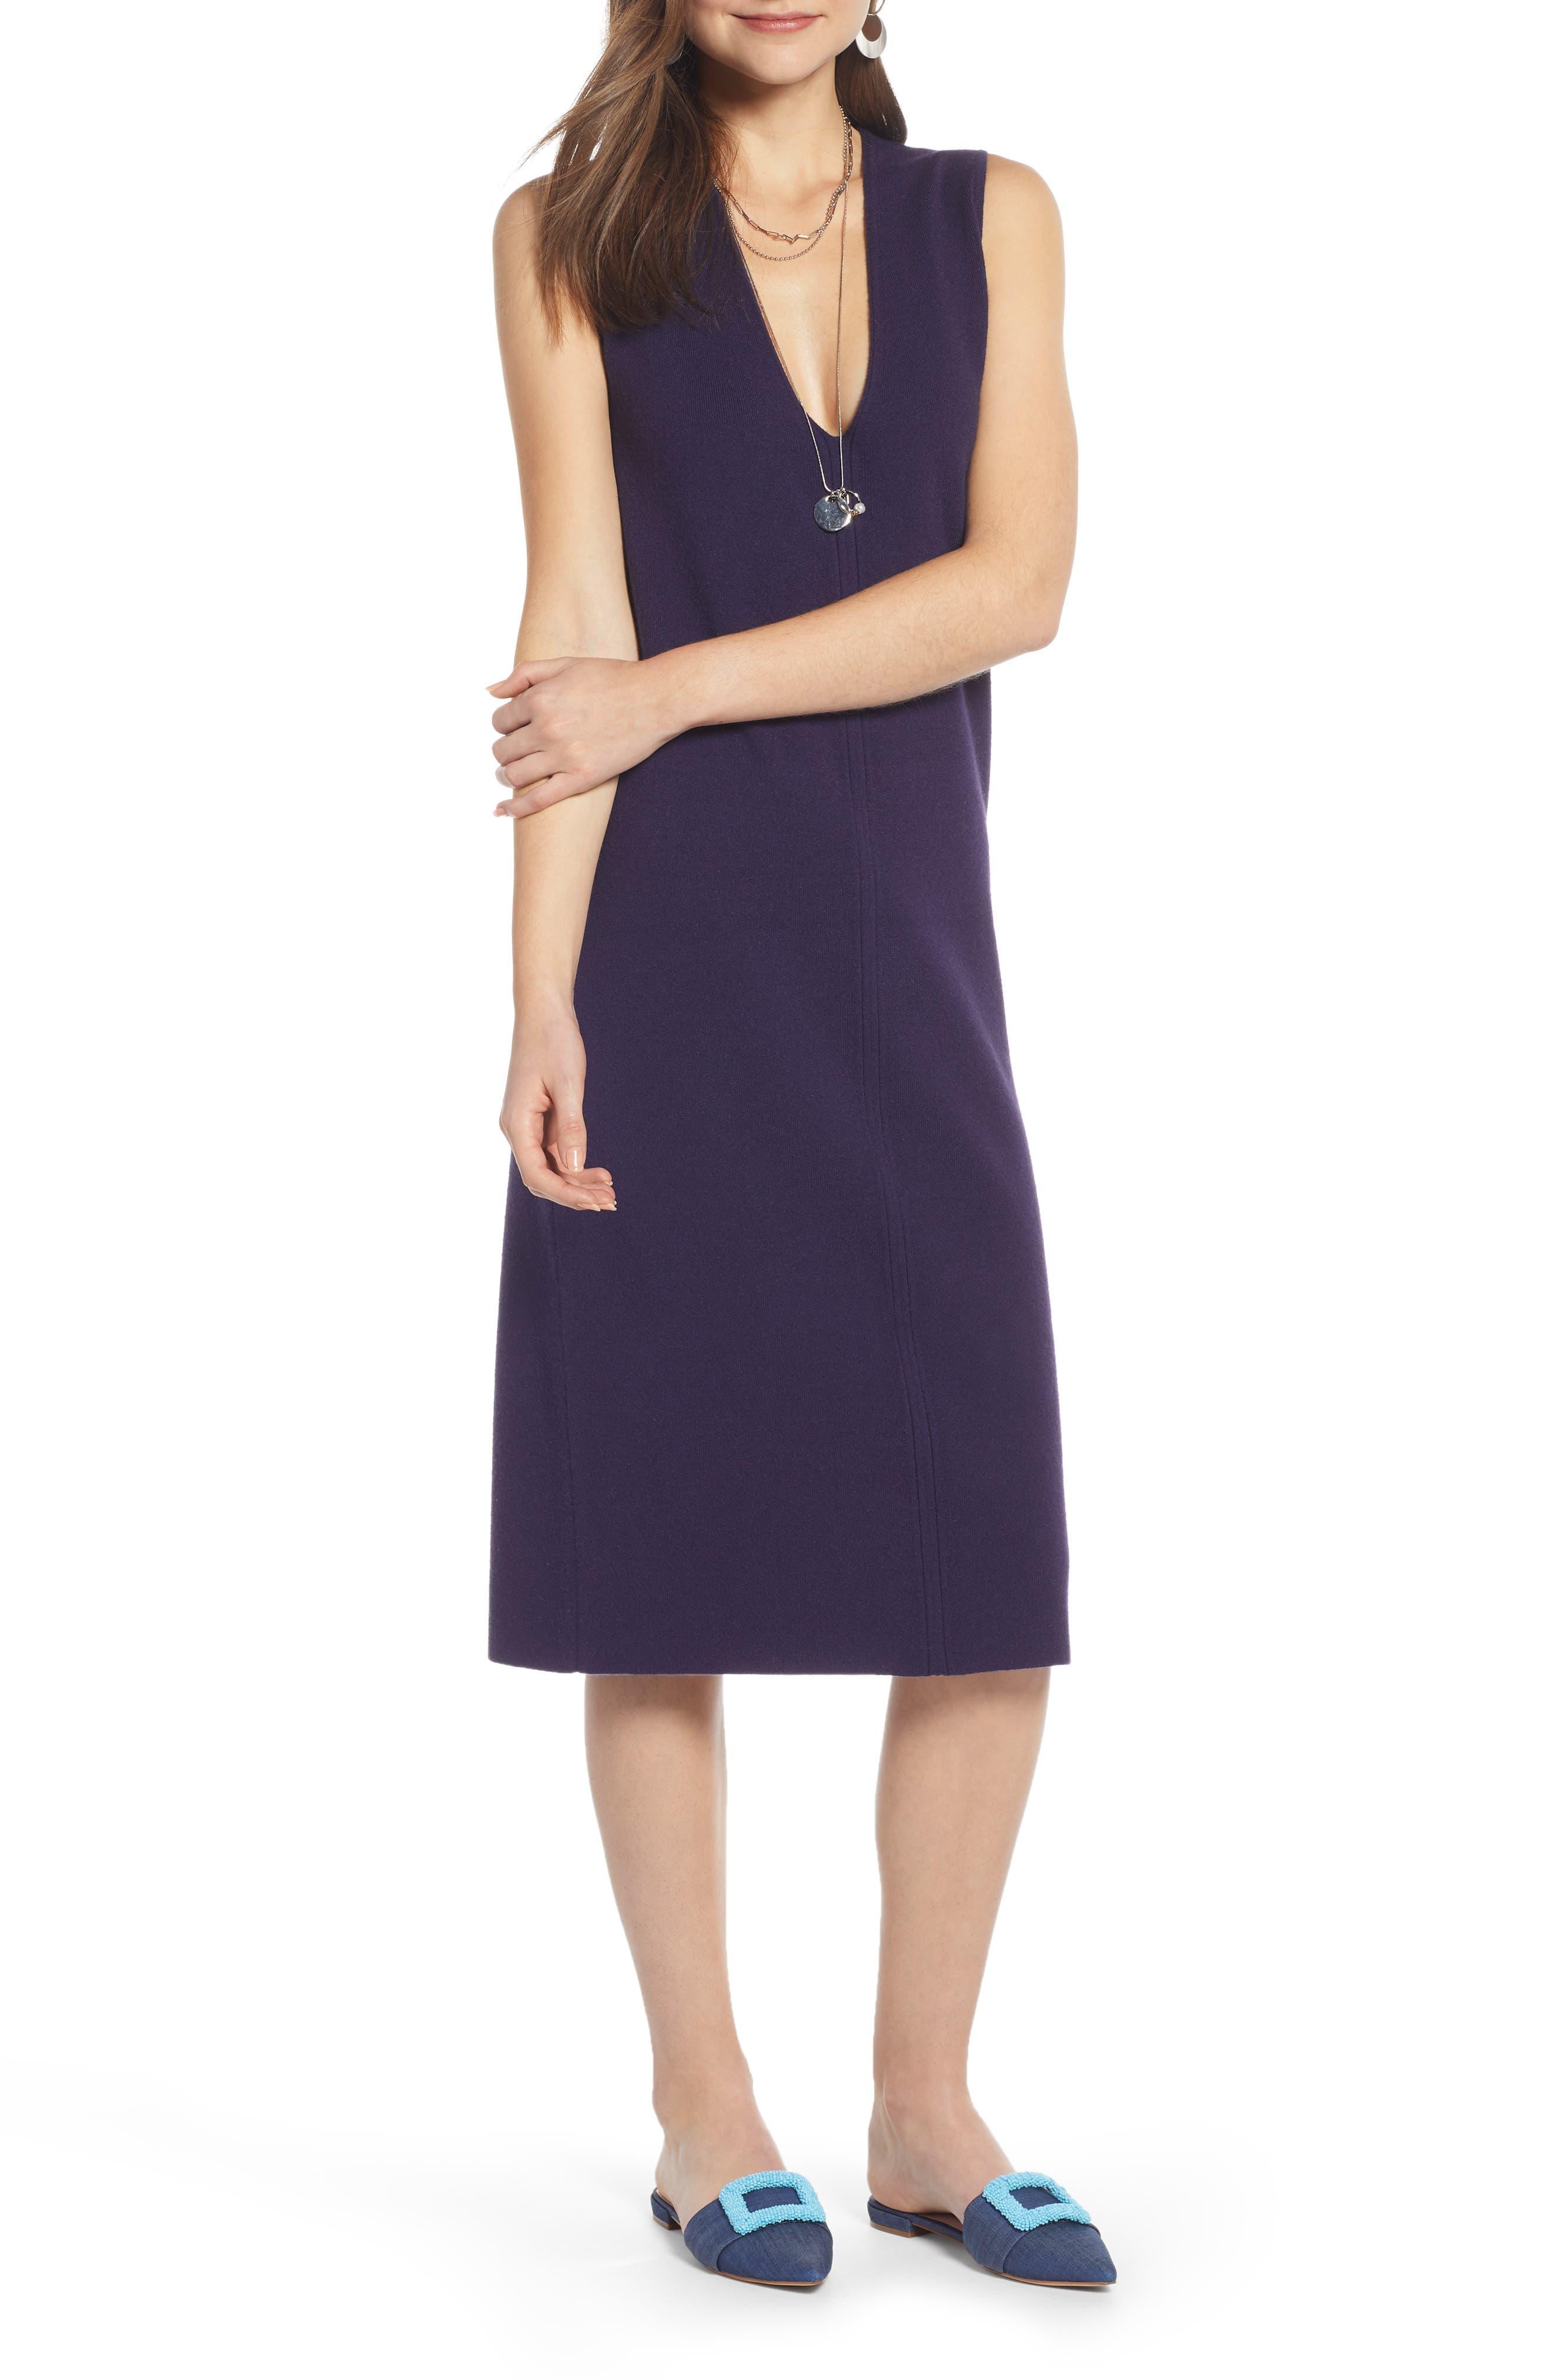 SOMETHING NAVY Sleeveless Sweater Dress, Main, color, 401